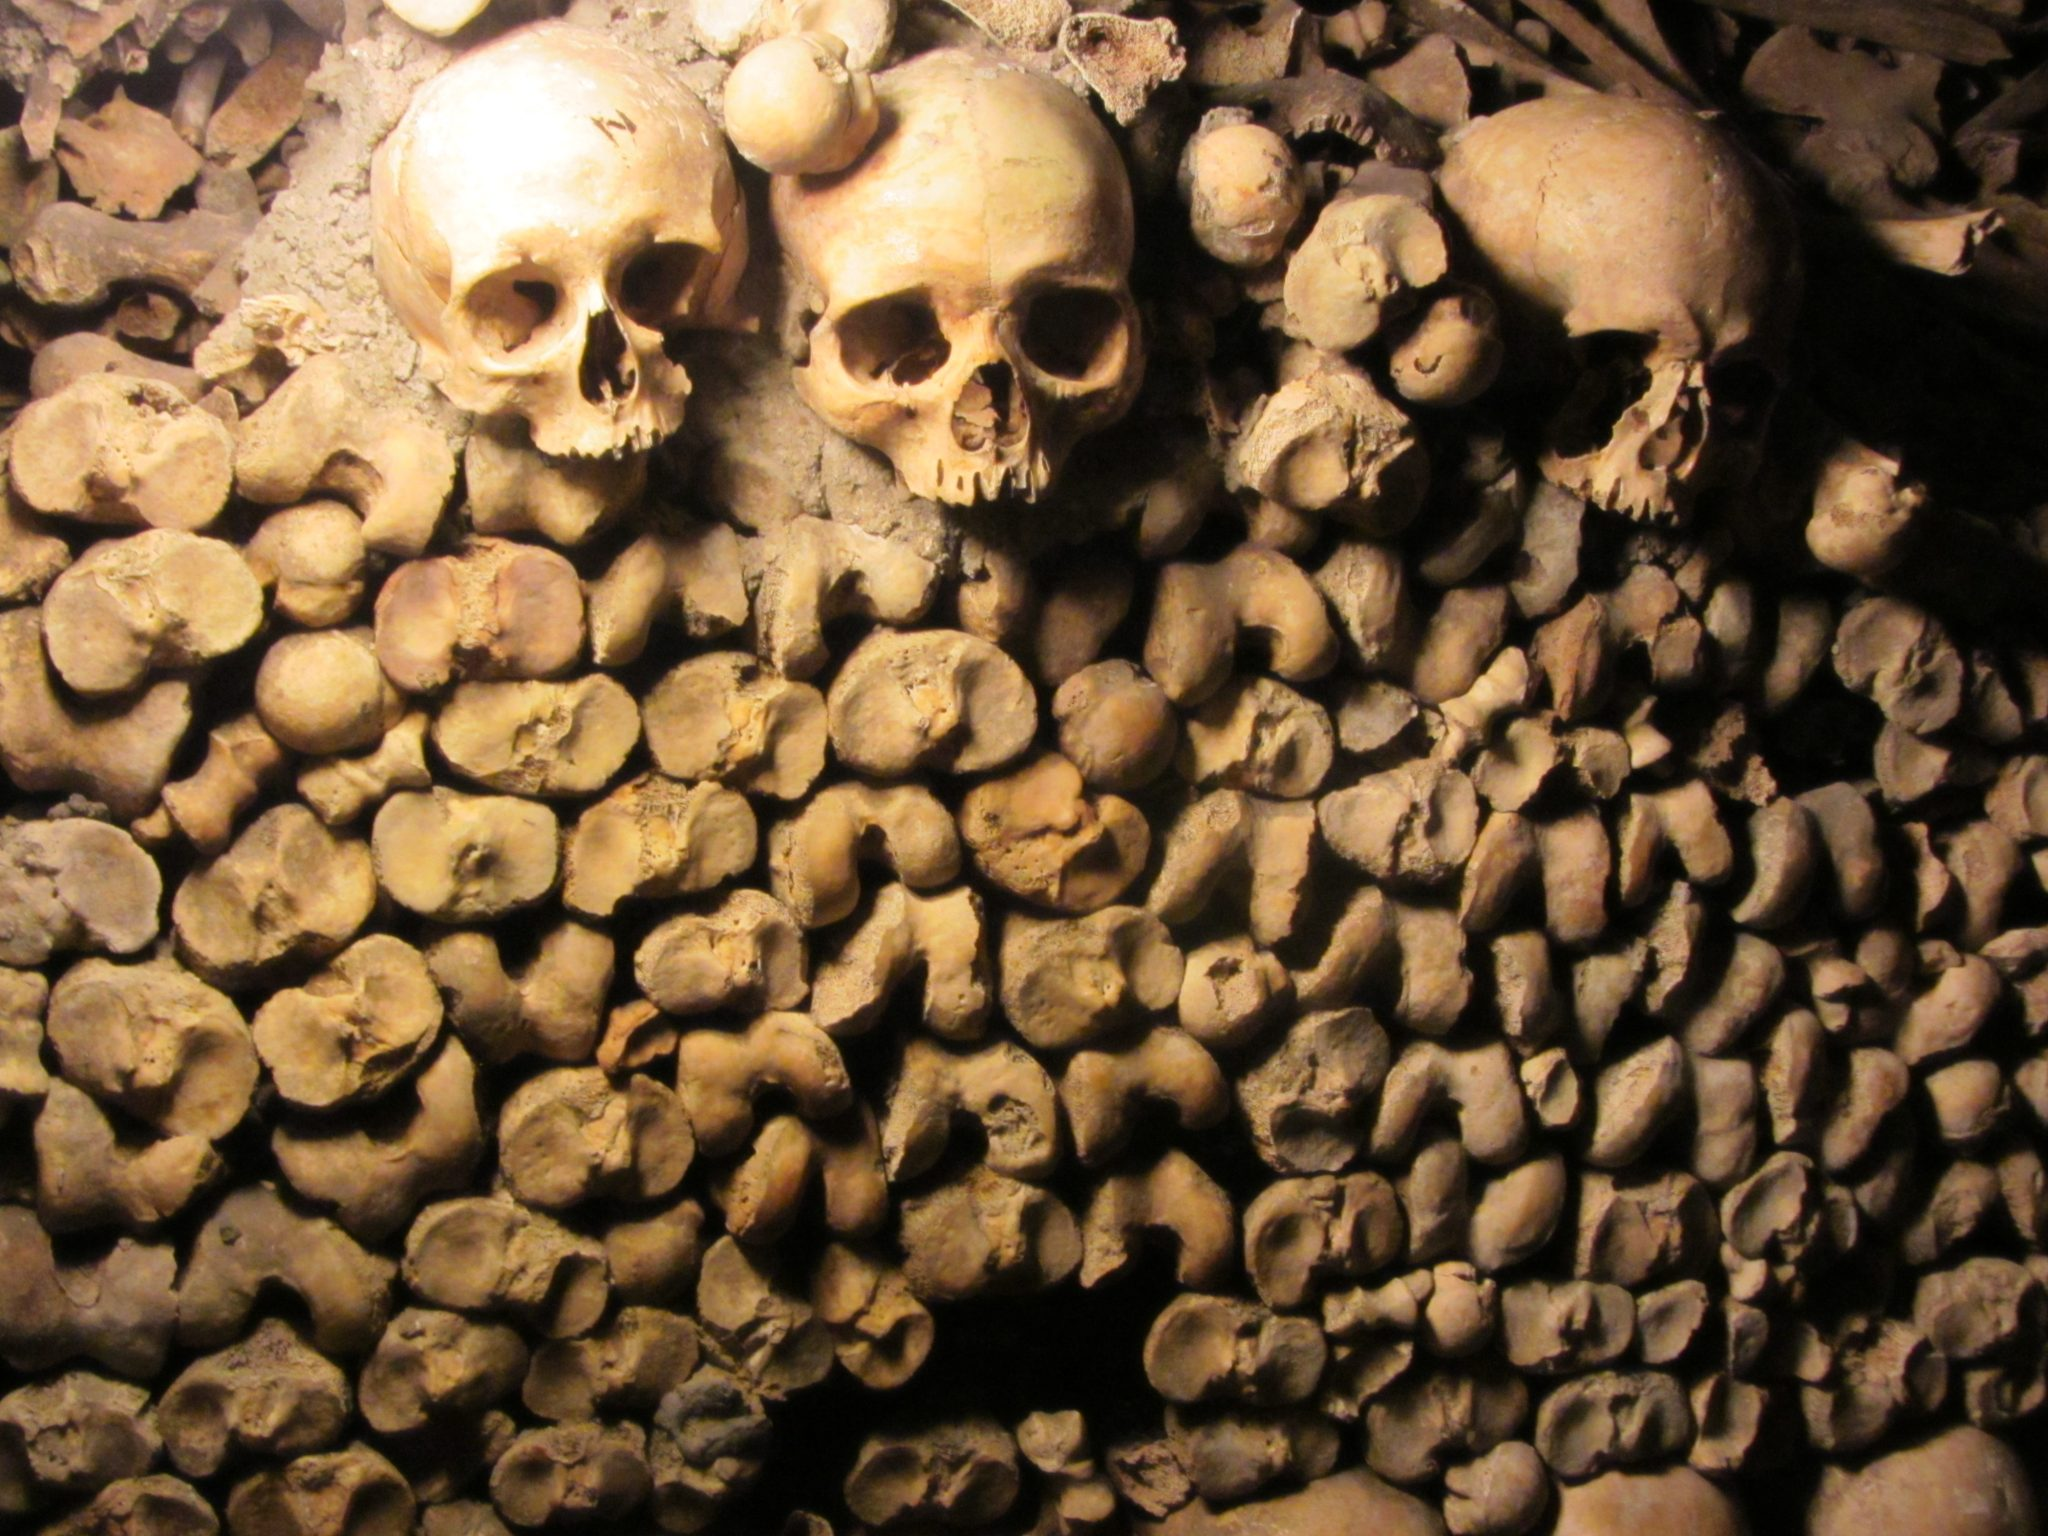 Skulls and Bones in the Catacombs in Paris